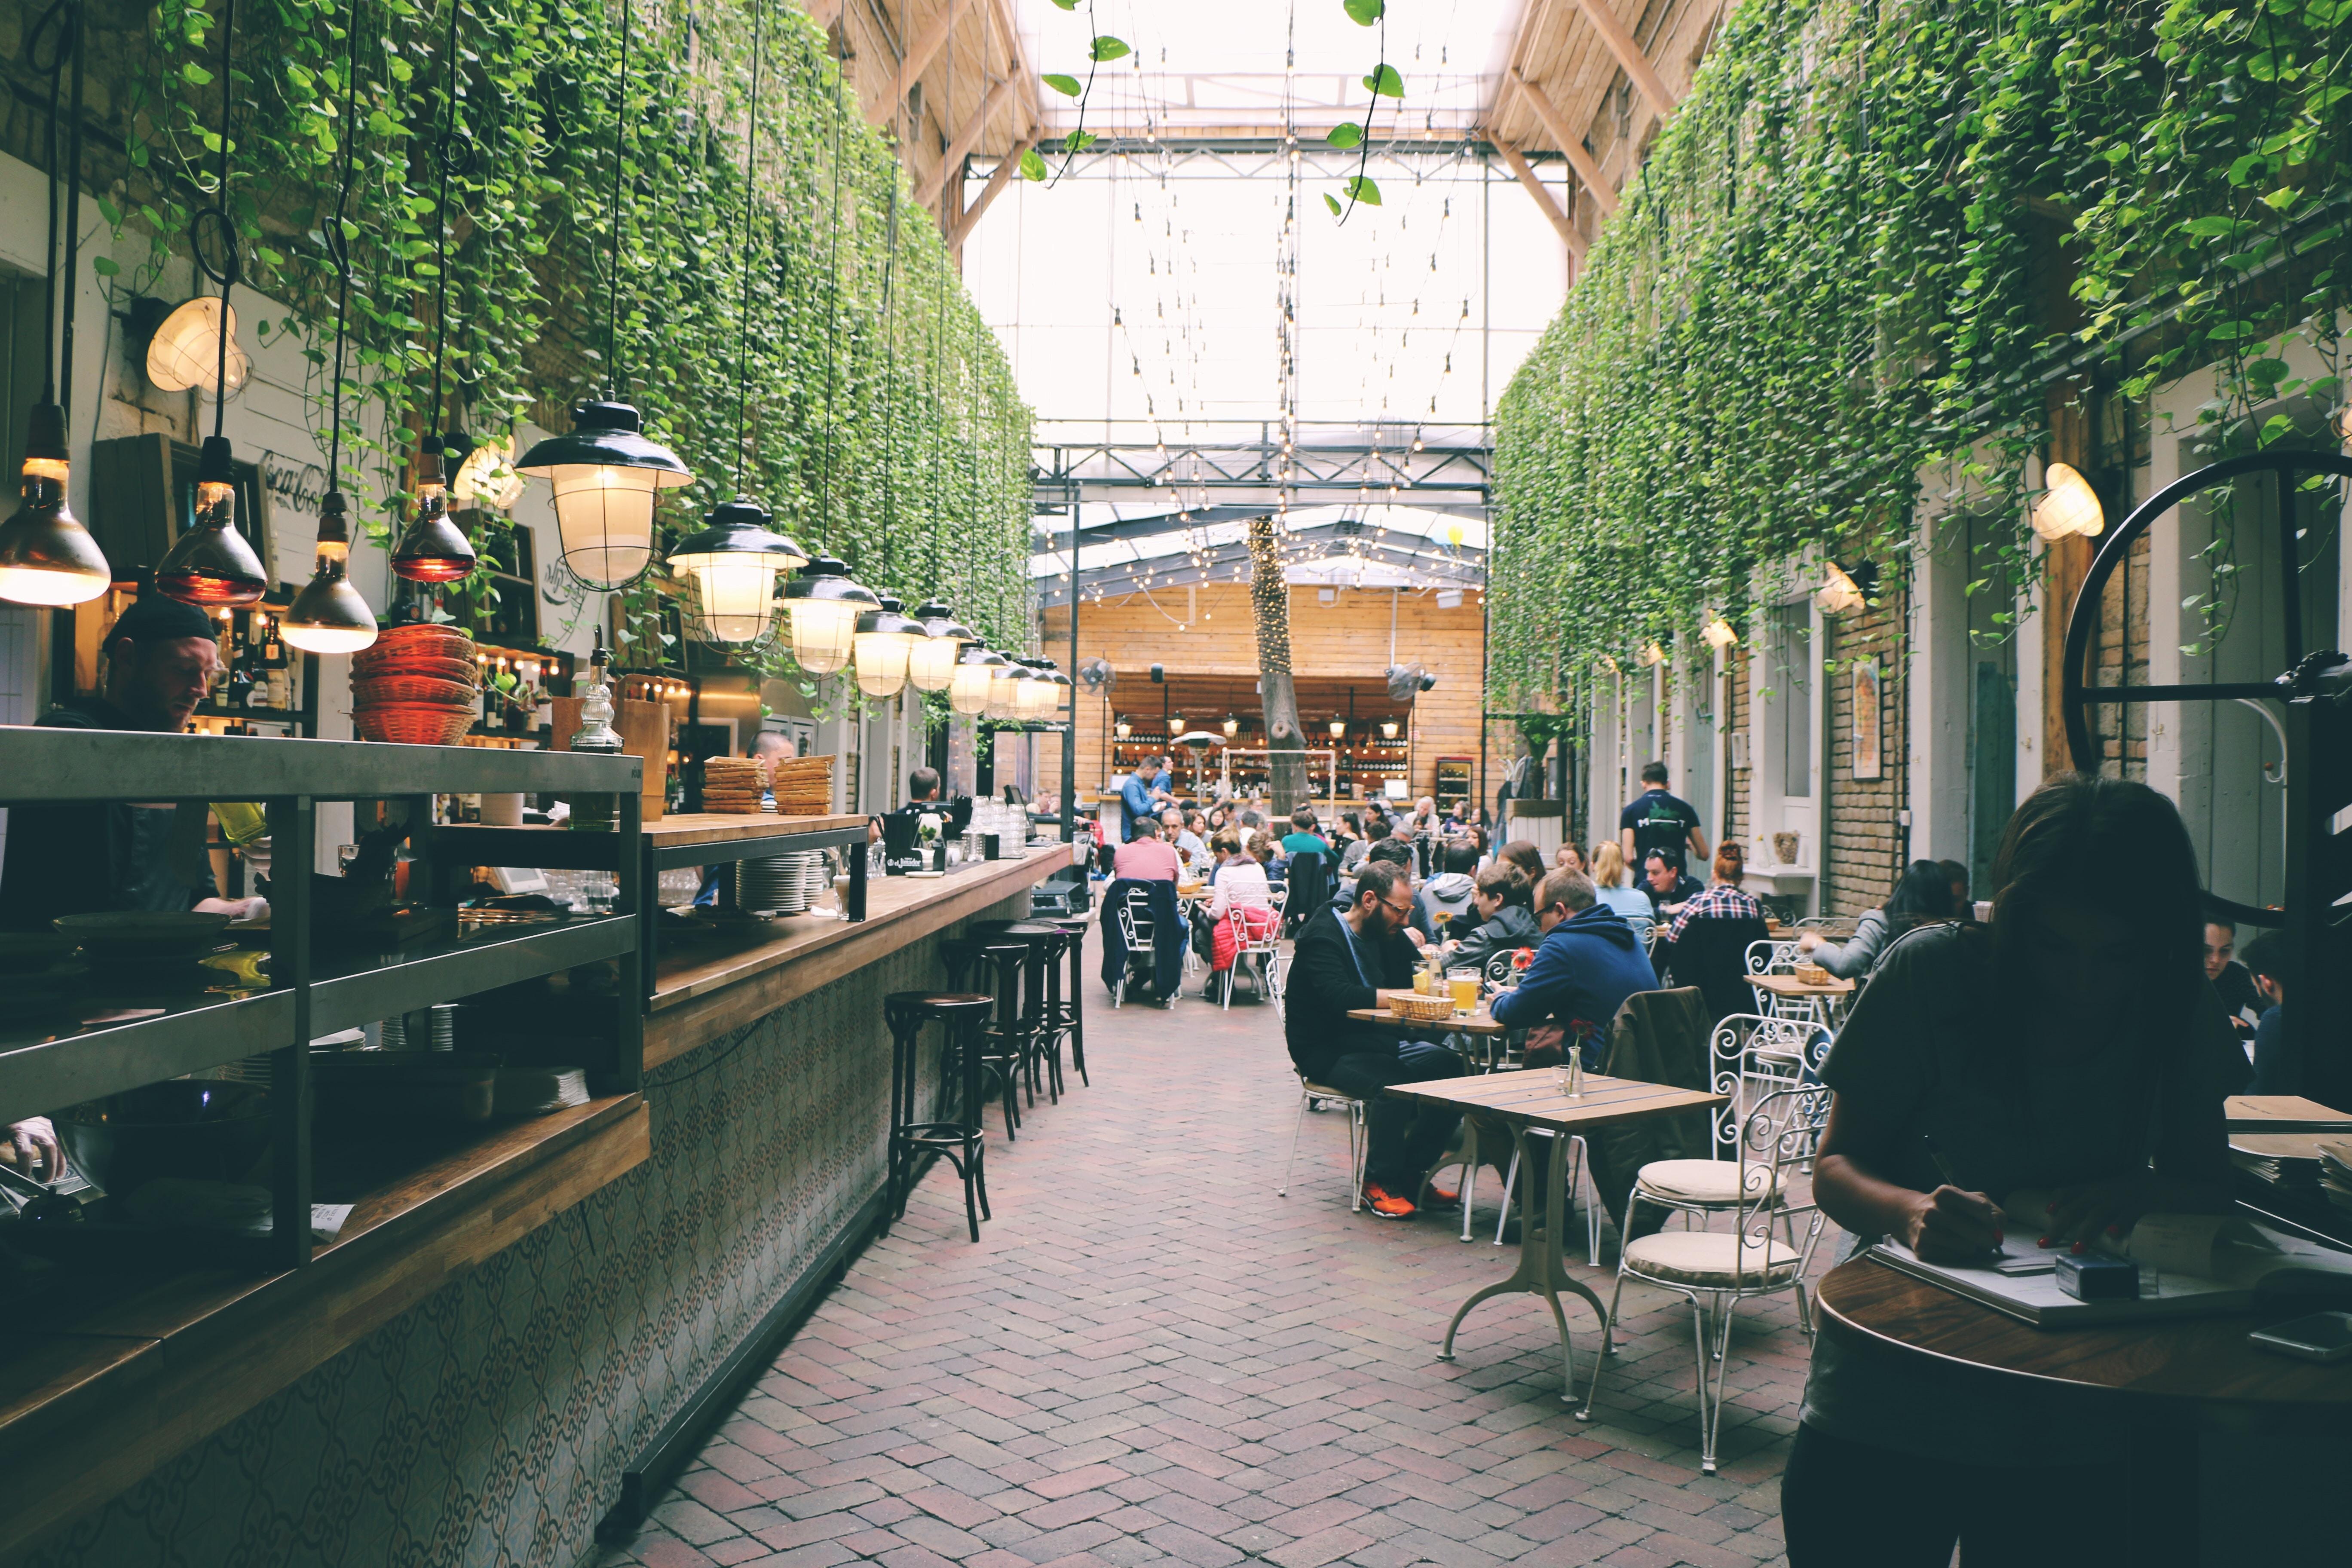 people sitting inside restaurant tables